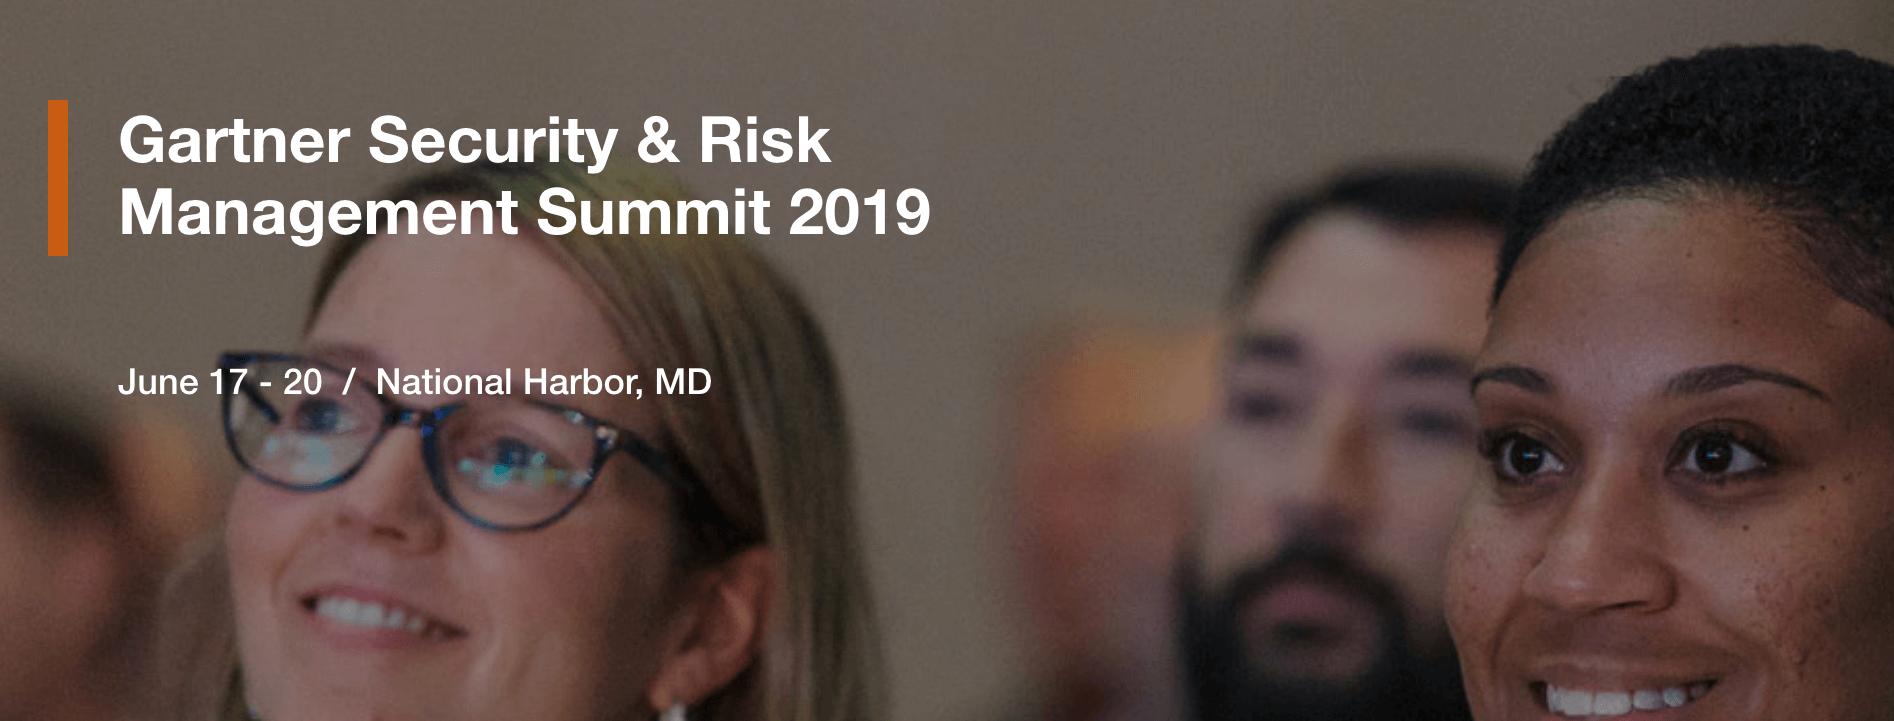 Gartner Security & Risk Summit 2019